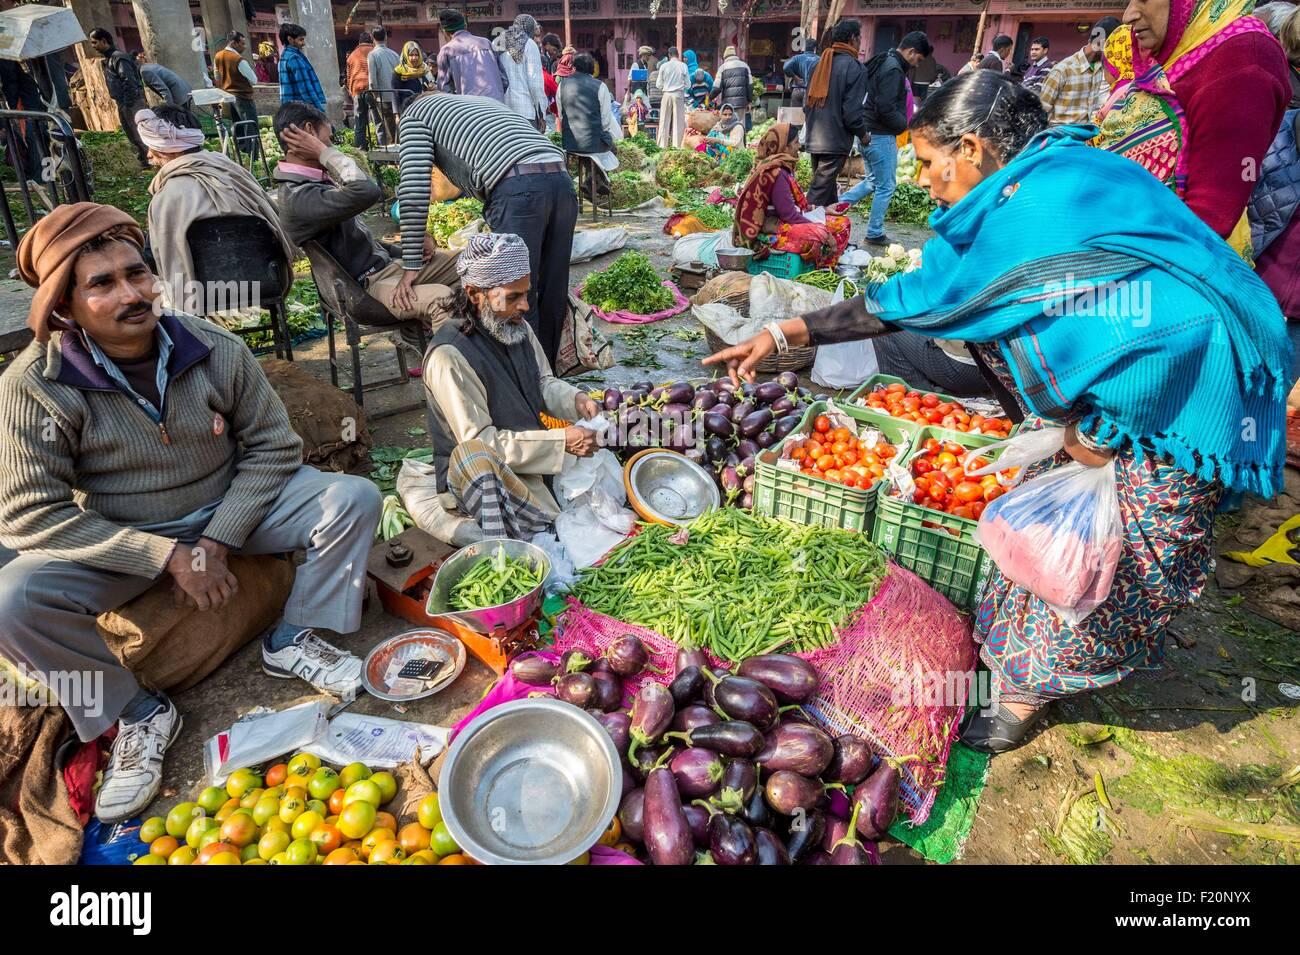 India, Rajasthan state, Jaipur, Chandi Ki Taksal vegetable market Stock Photo